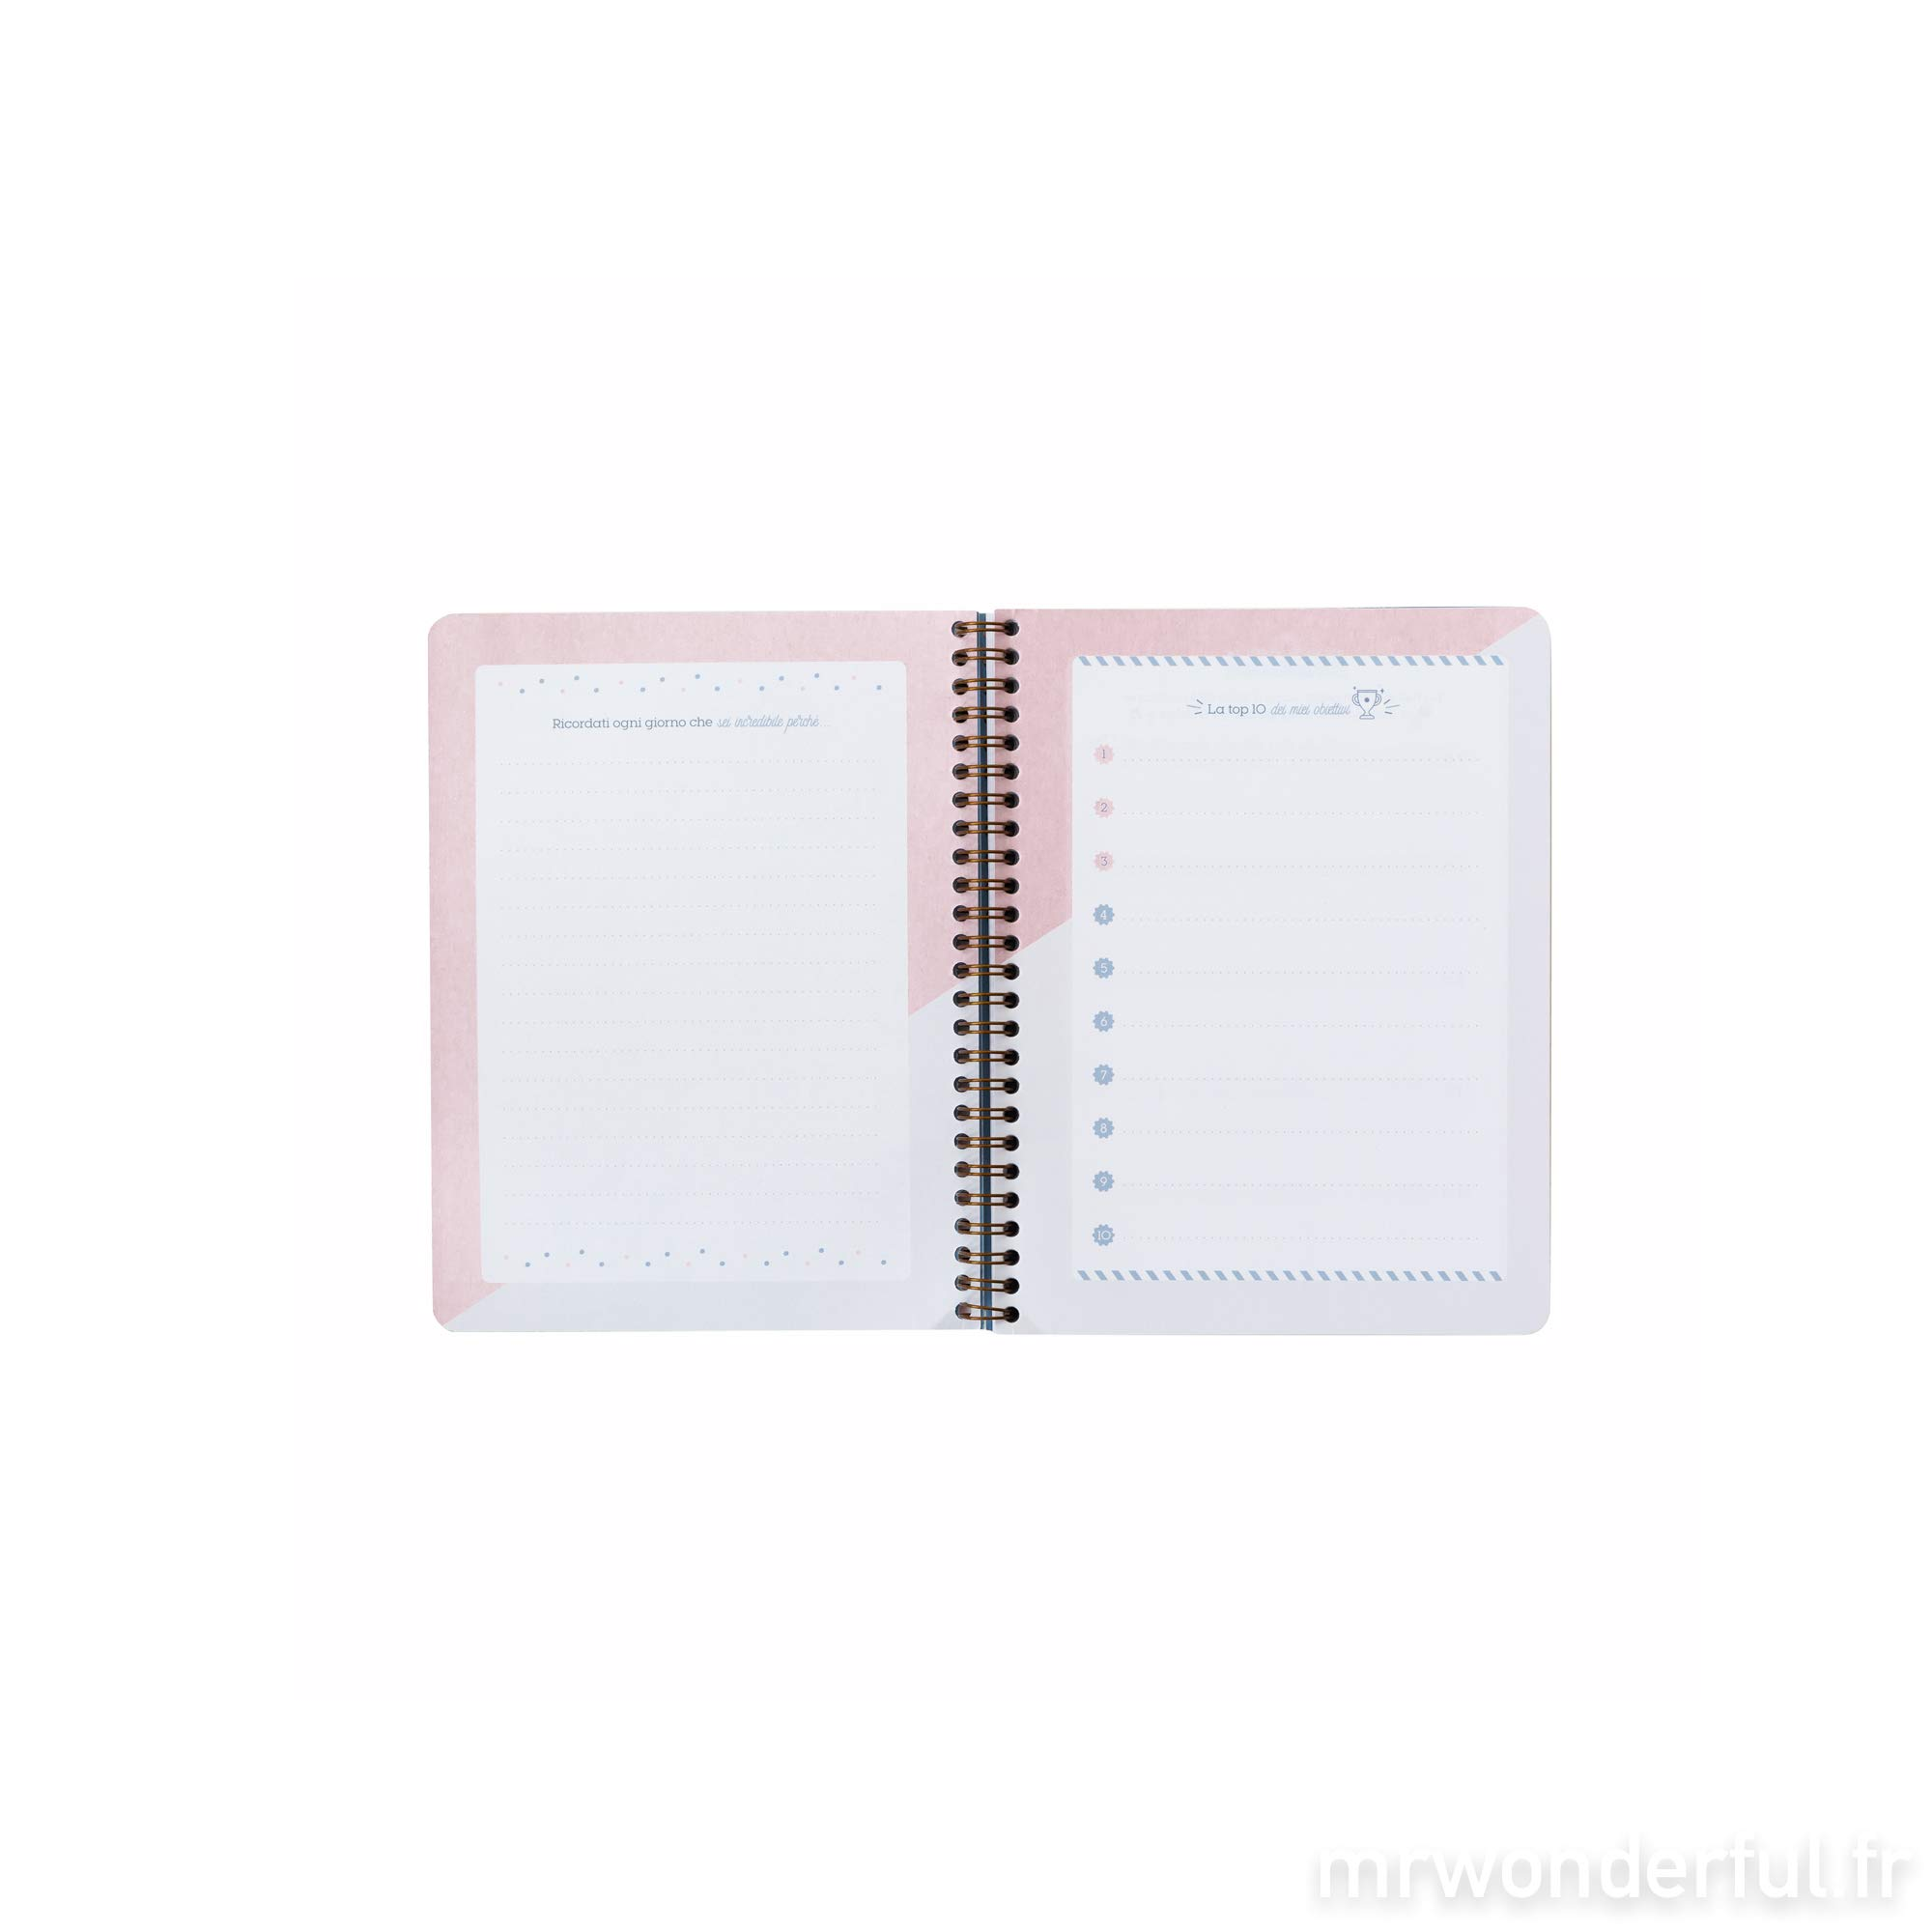 Mr. Wonderful WOA09056IT Weekly Planner Notebook by Mr. Wonderful (Image #5)